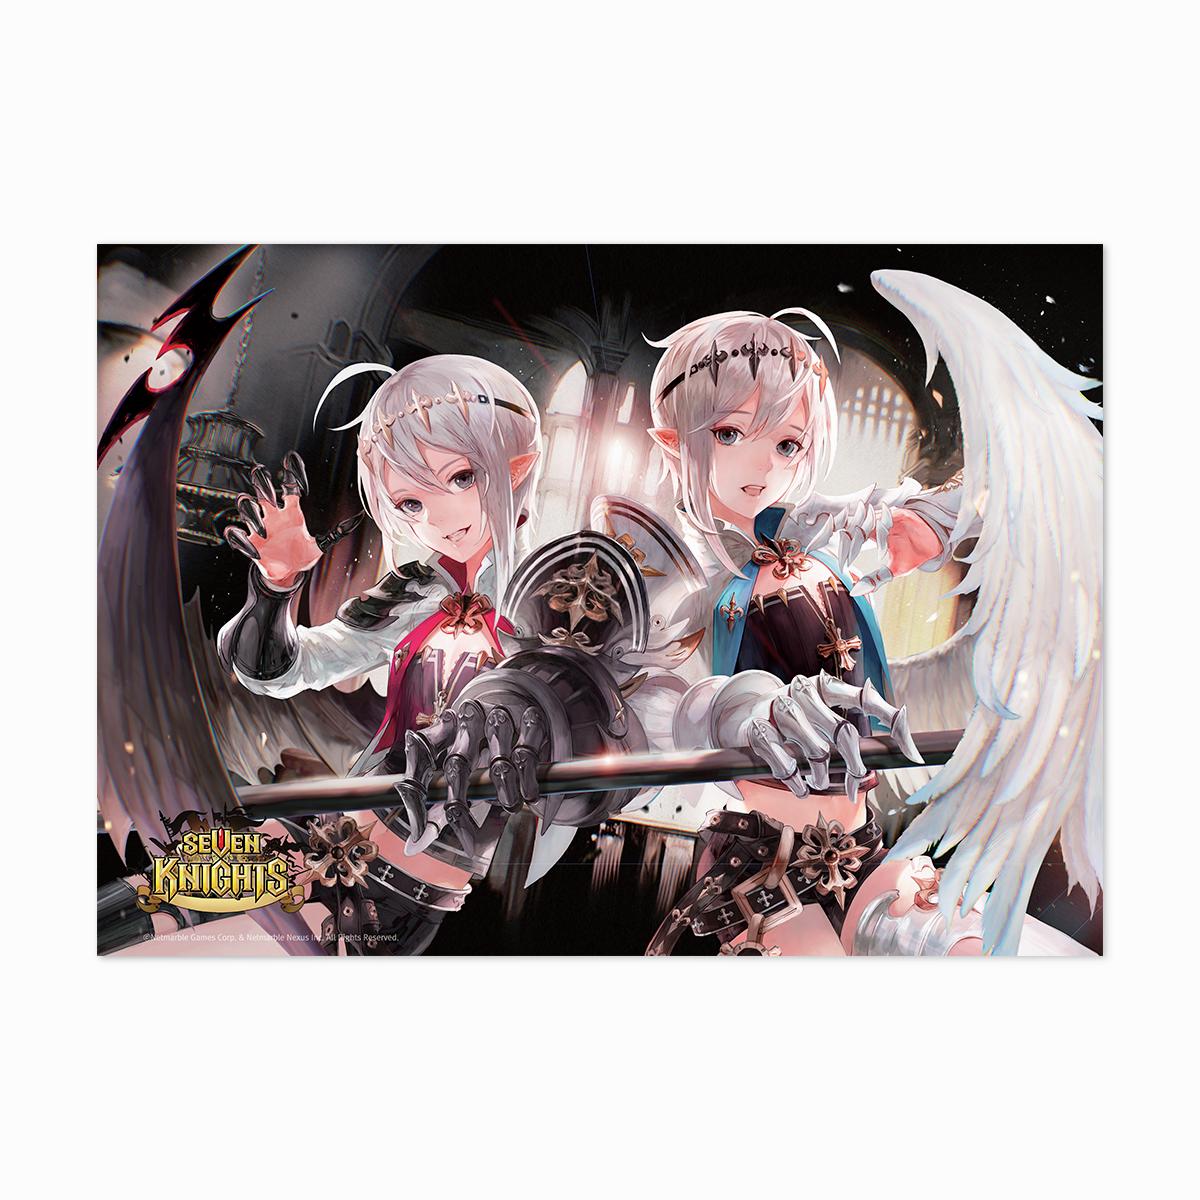 Seven Knights Branze & Bransel, Kagura Poster